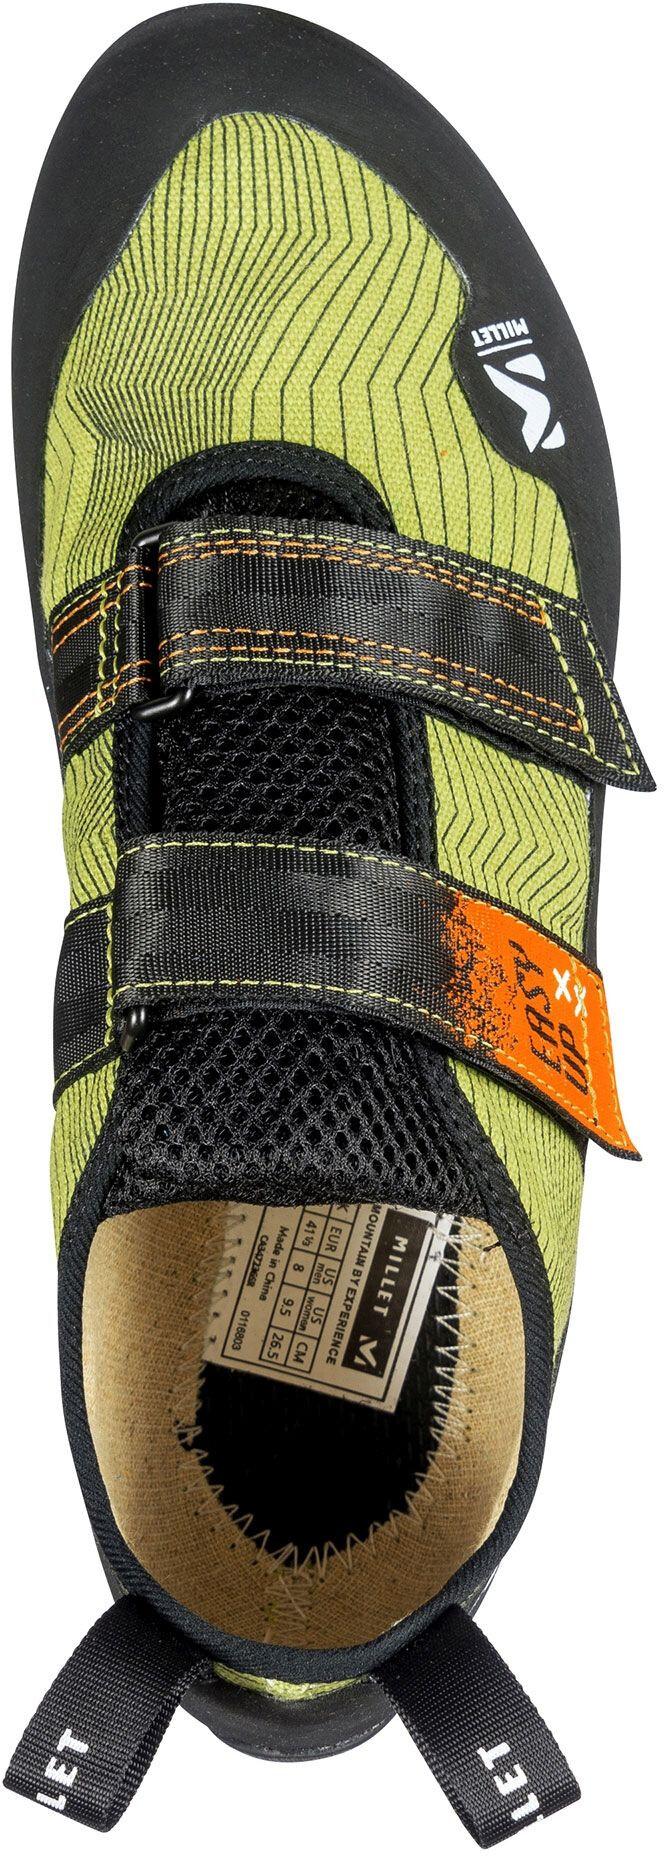 Millet Easy Up Scarpe da arrampicata, green moss (2020) 733615 uSel6